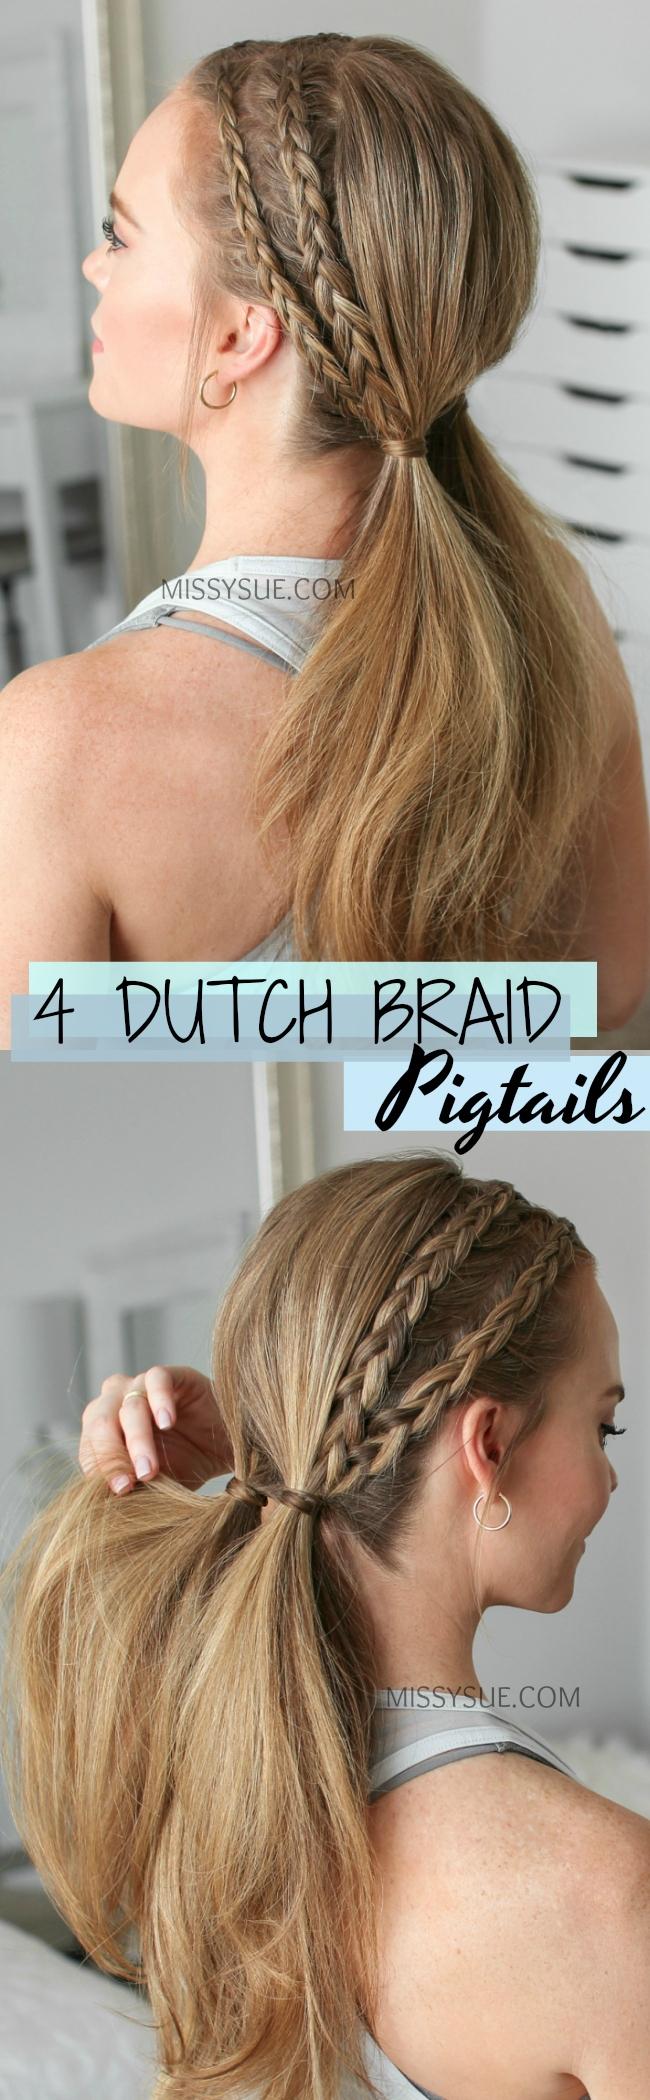 Four Dutch Braid Pigtails